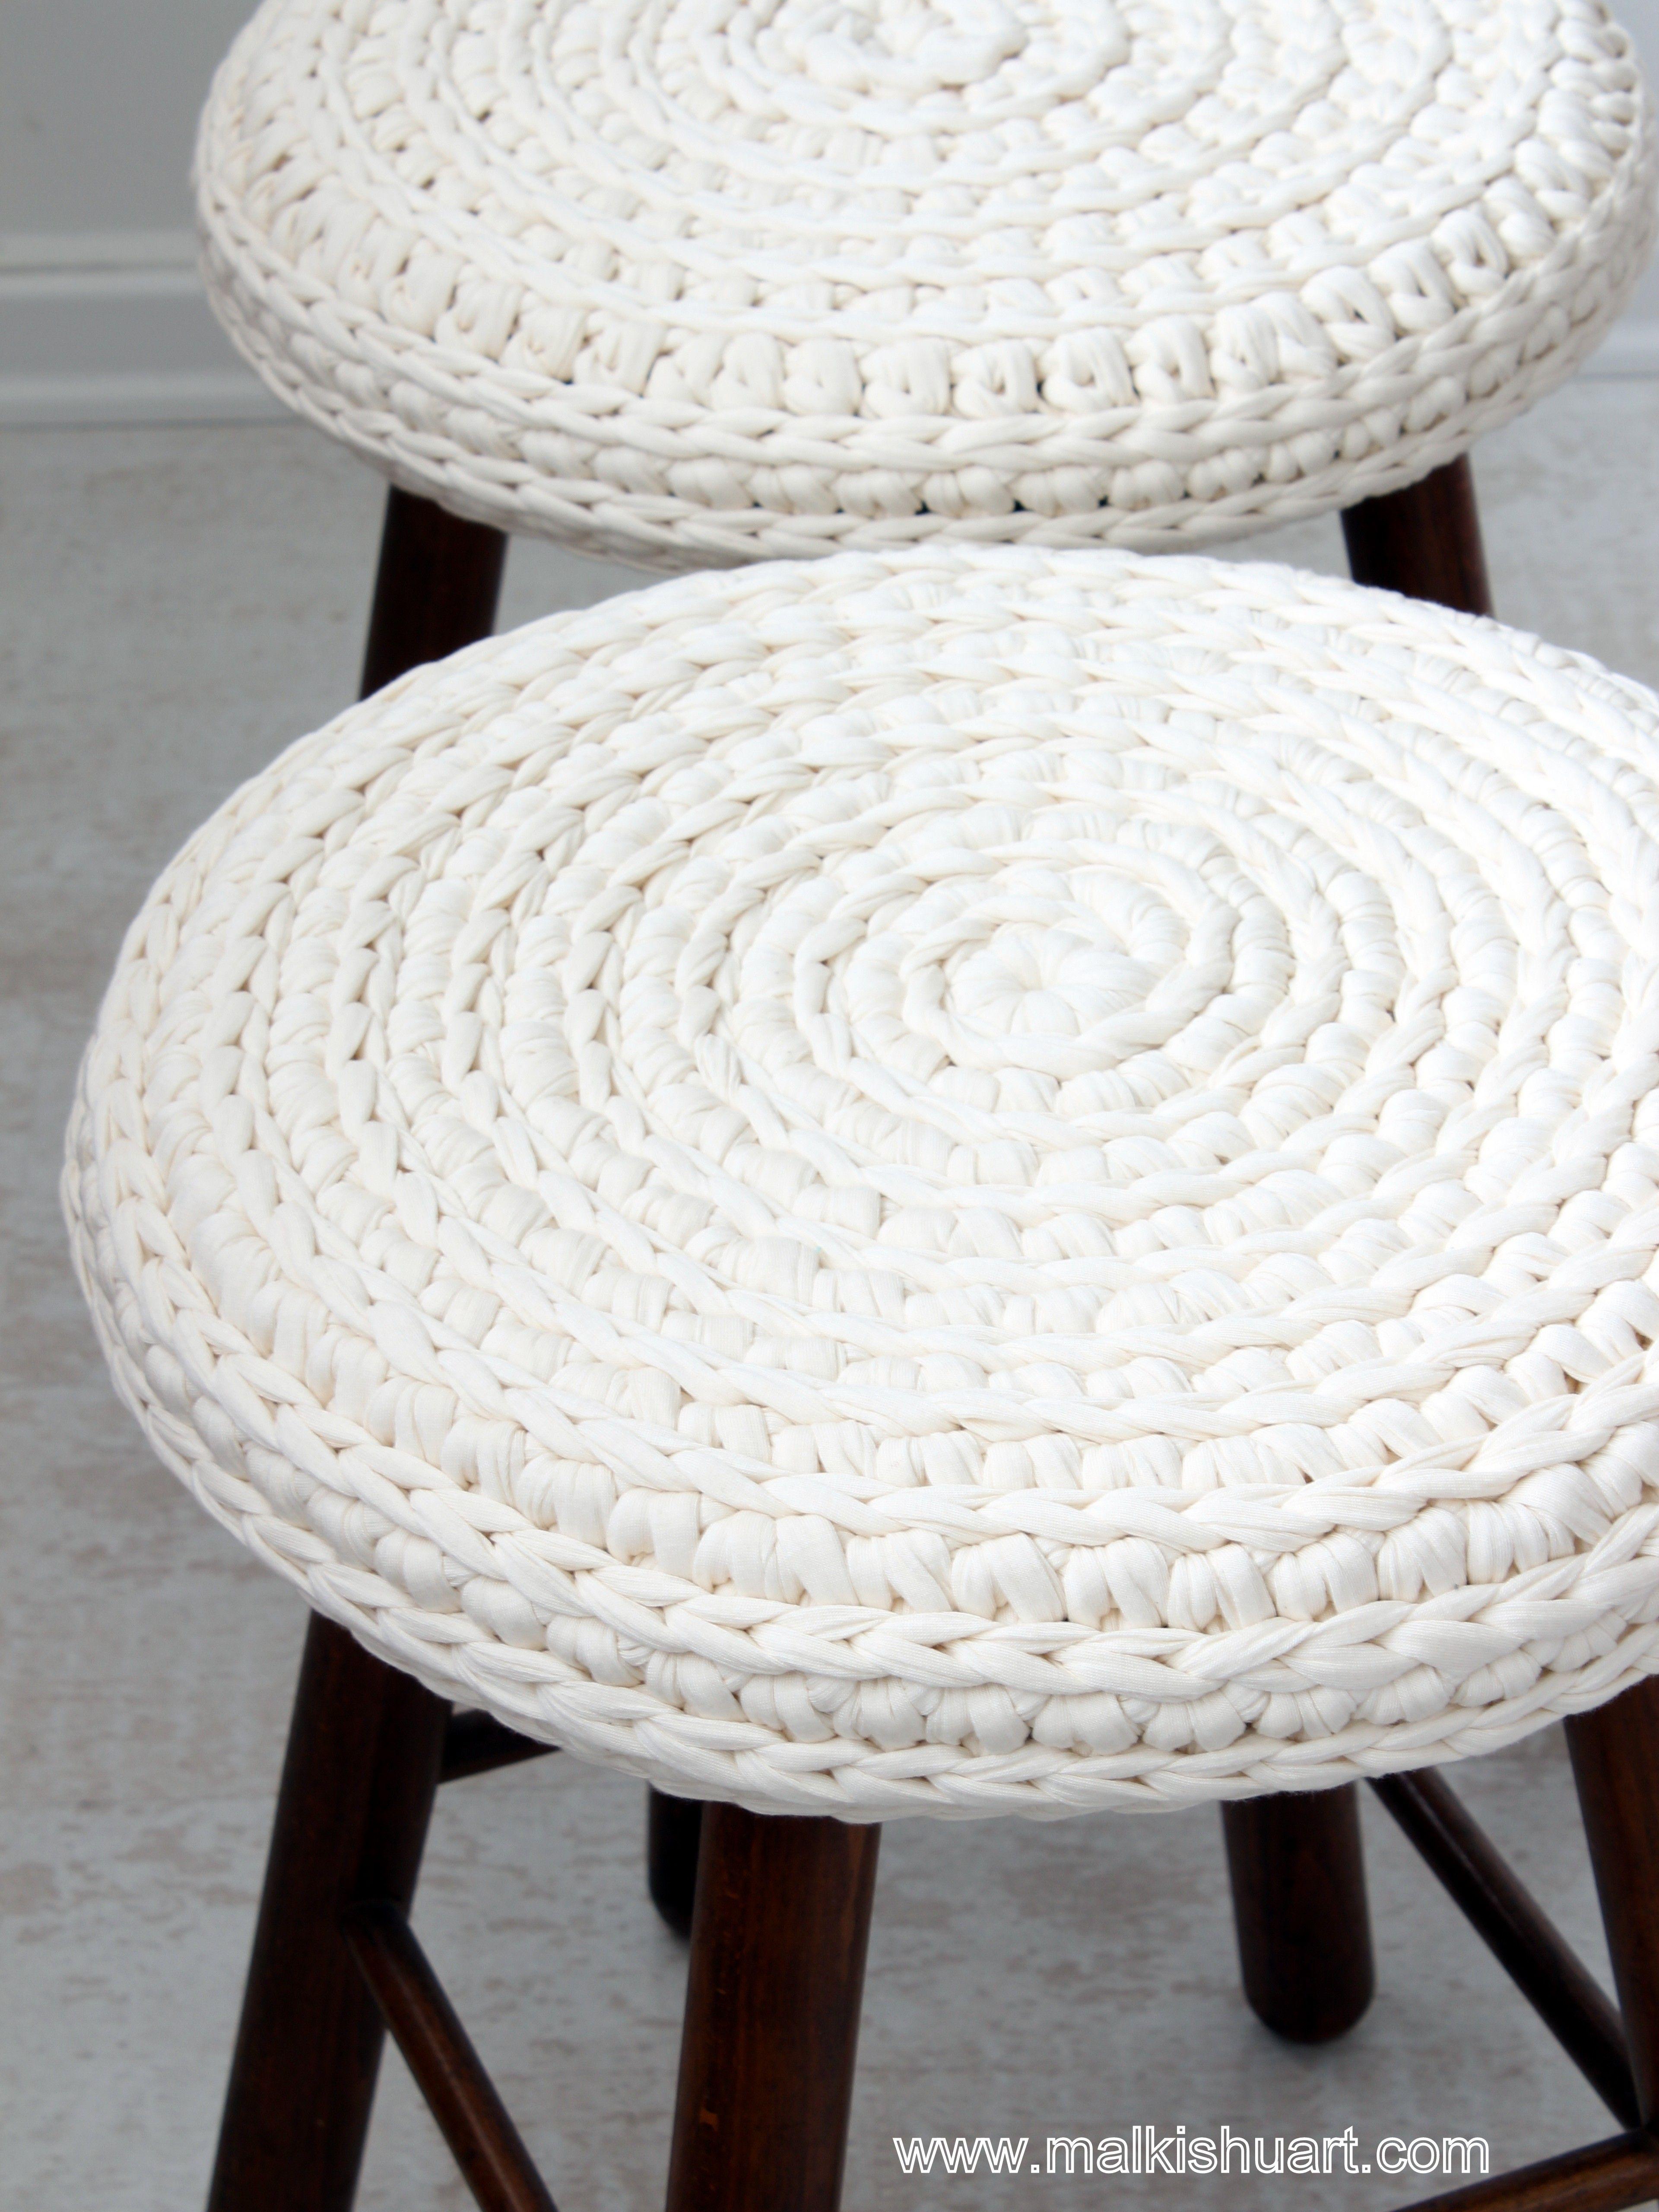 Spiral crochet stool made of T - Shirt yarn by Malkishuart.com ...